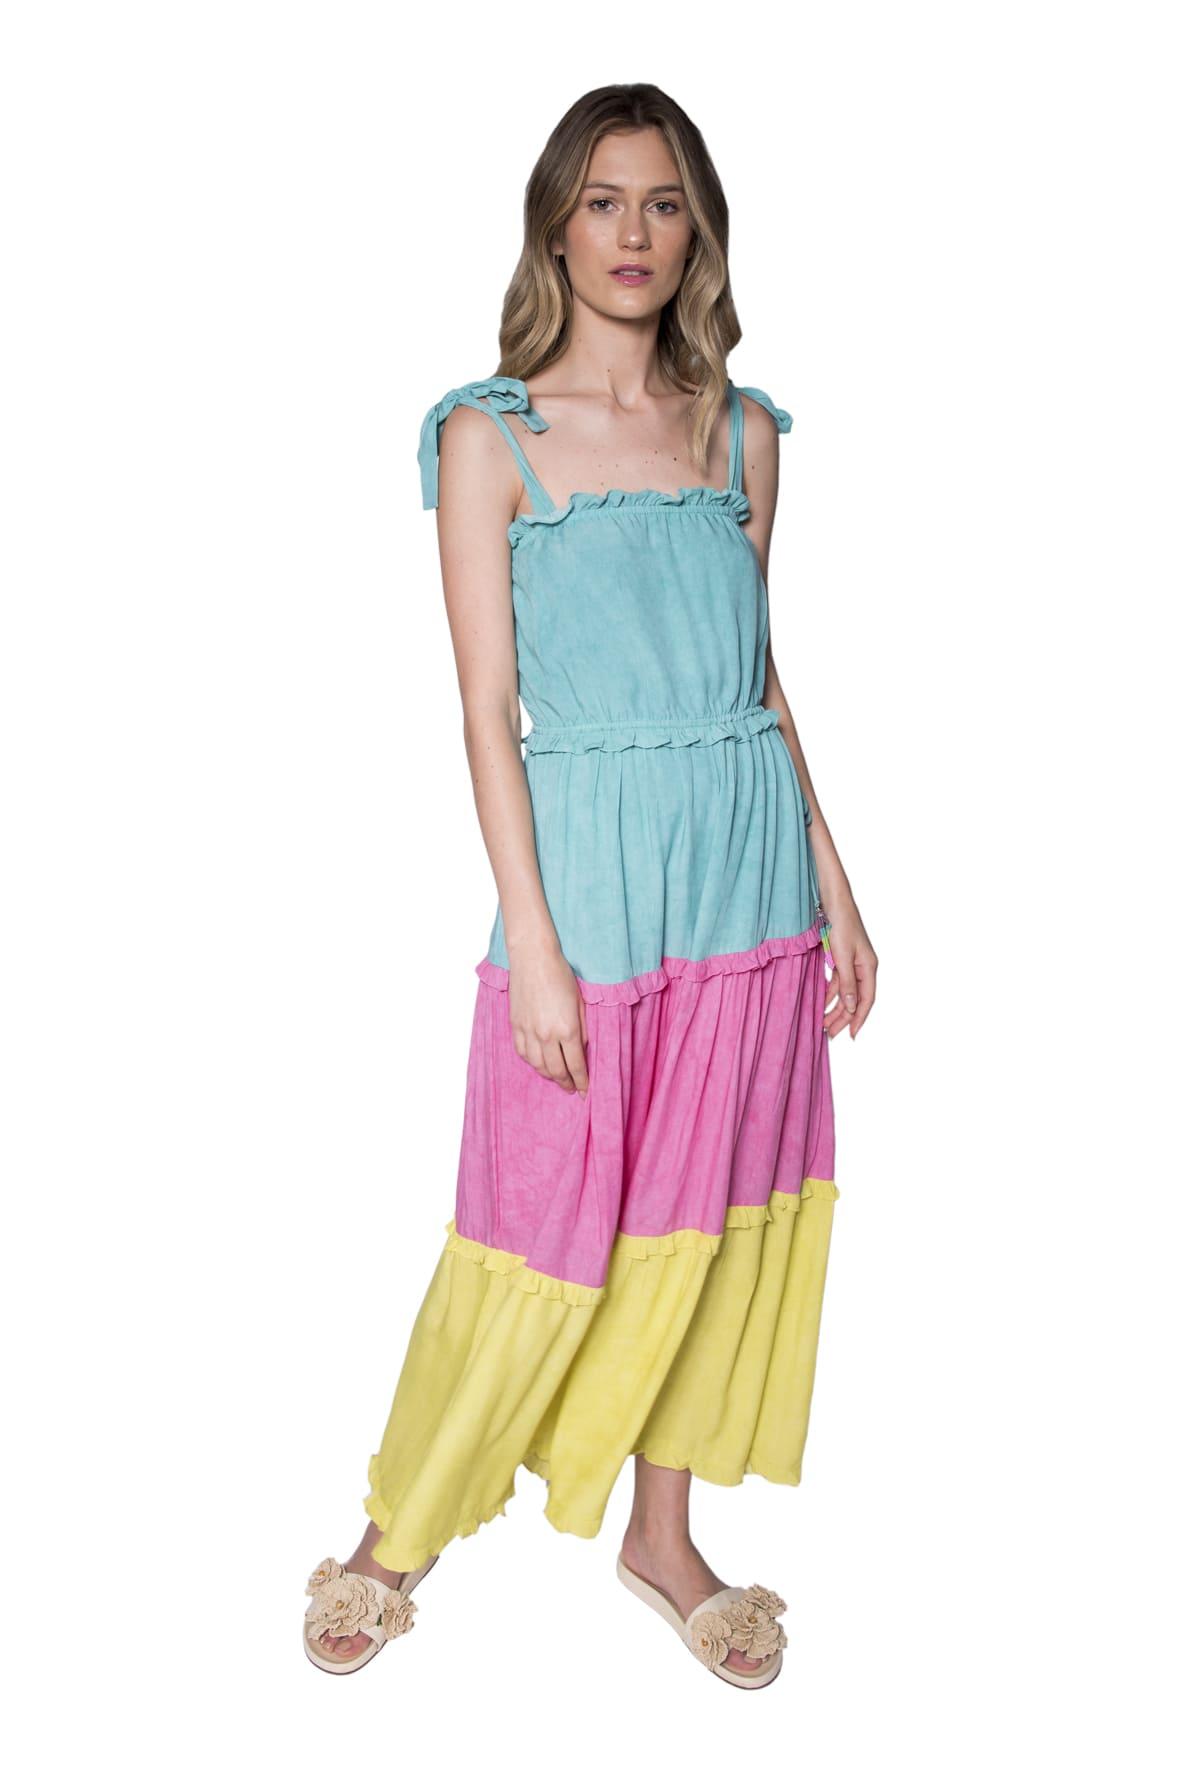 Tee Match - vestido voil tricolor